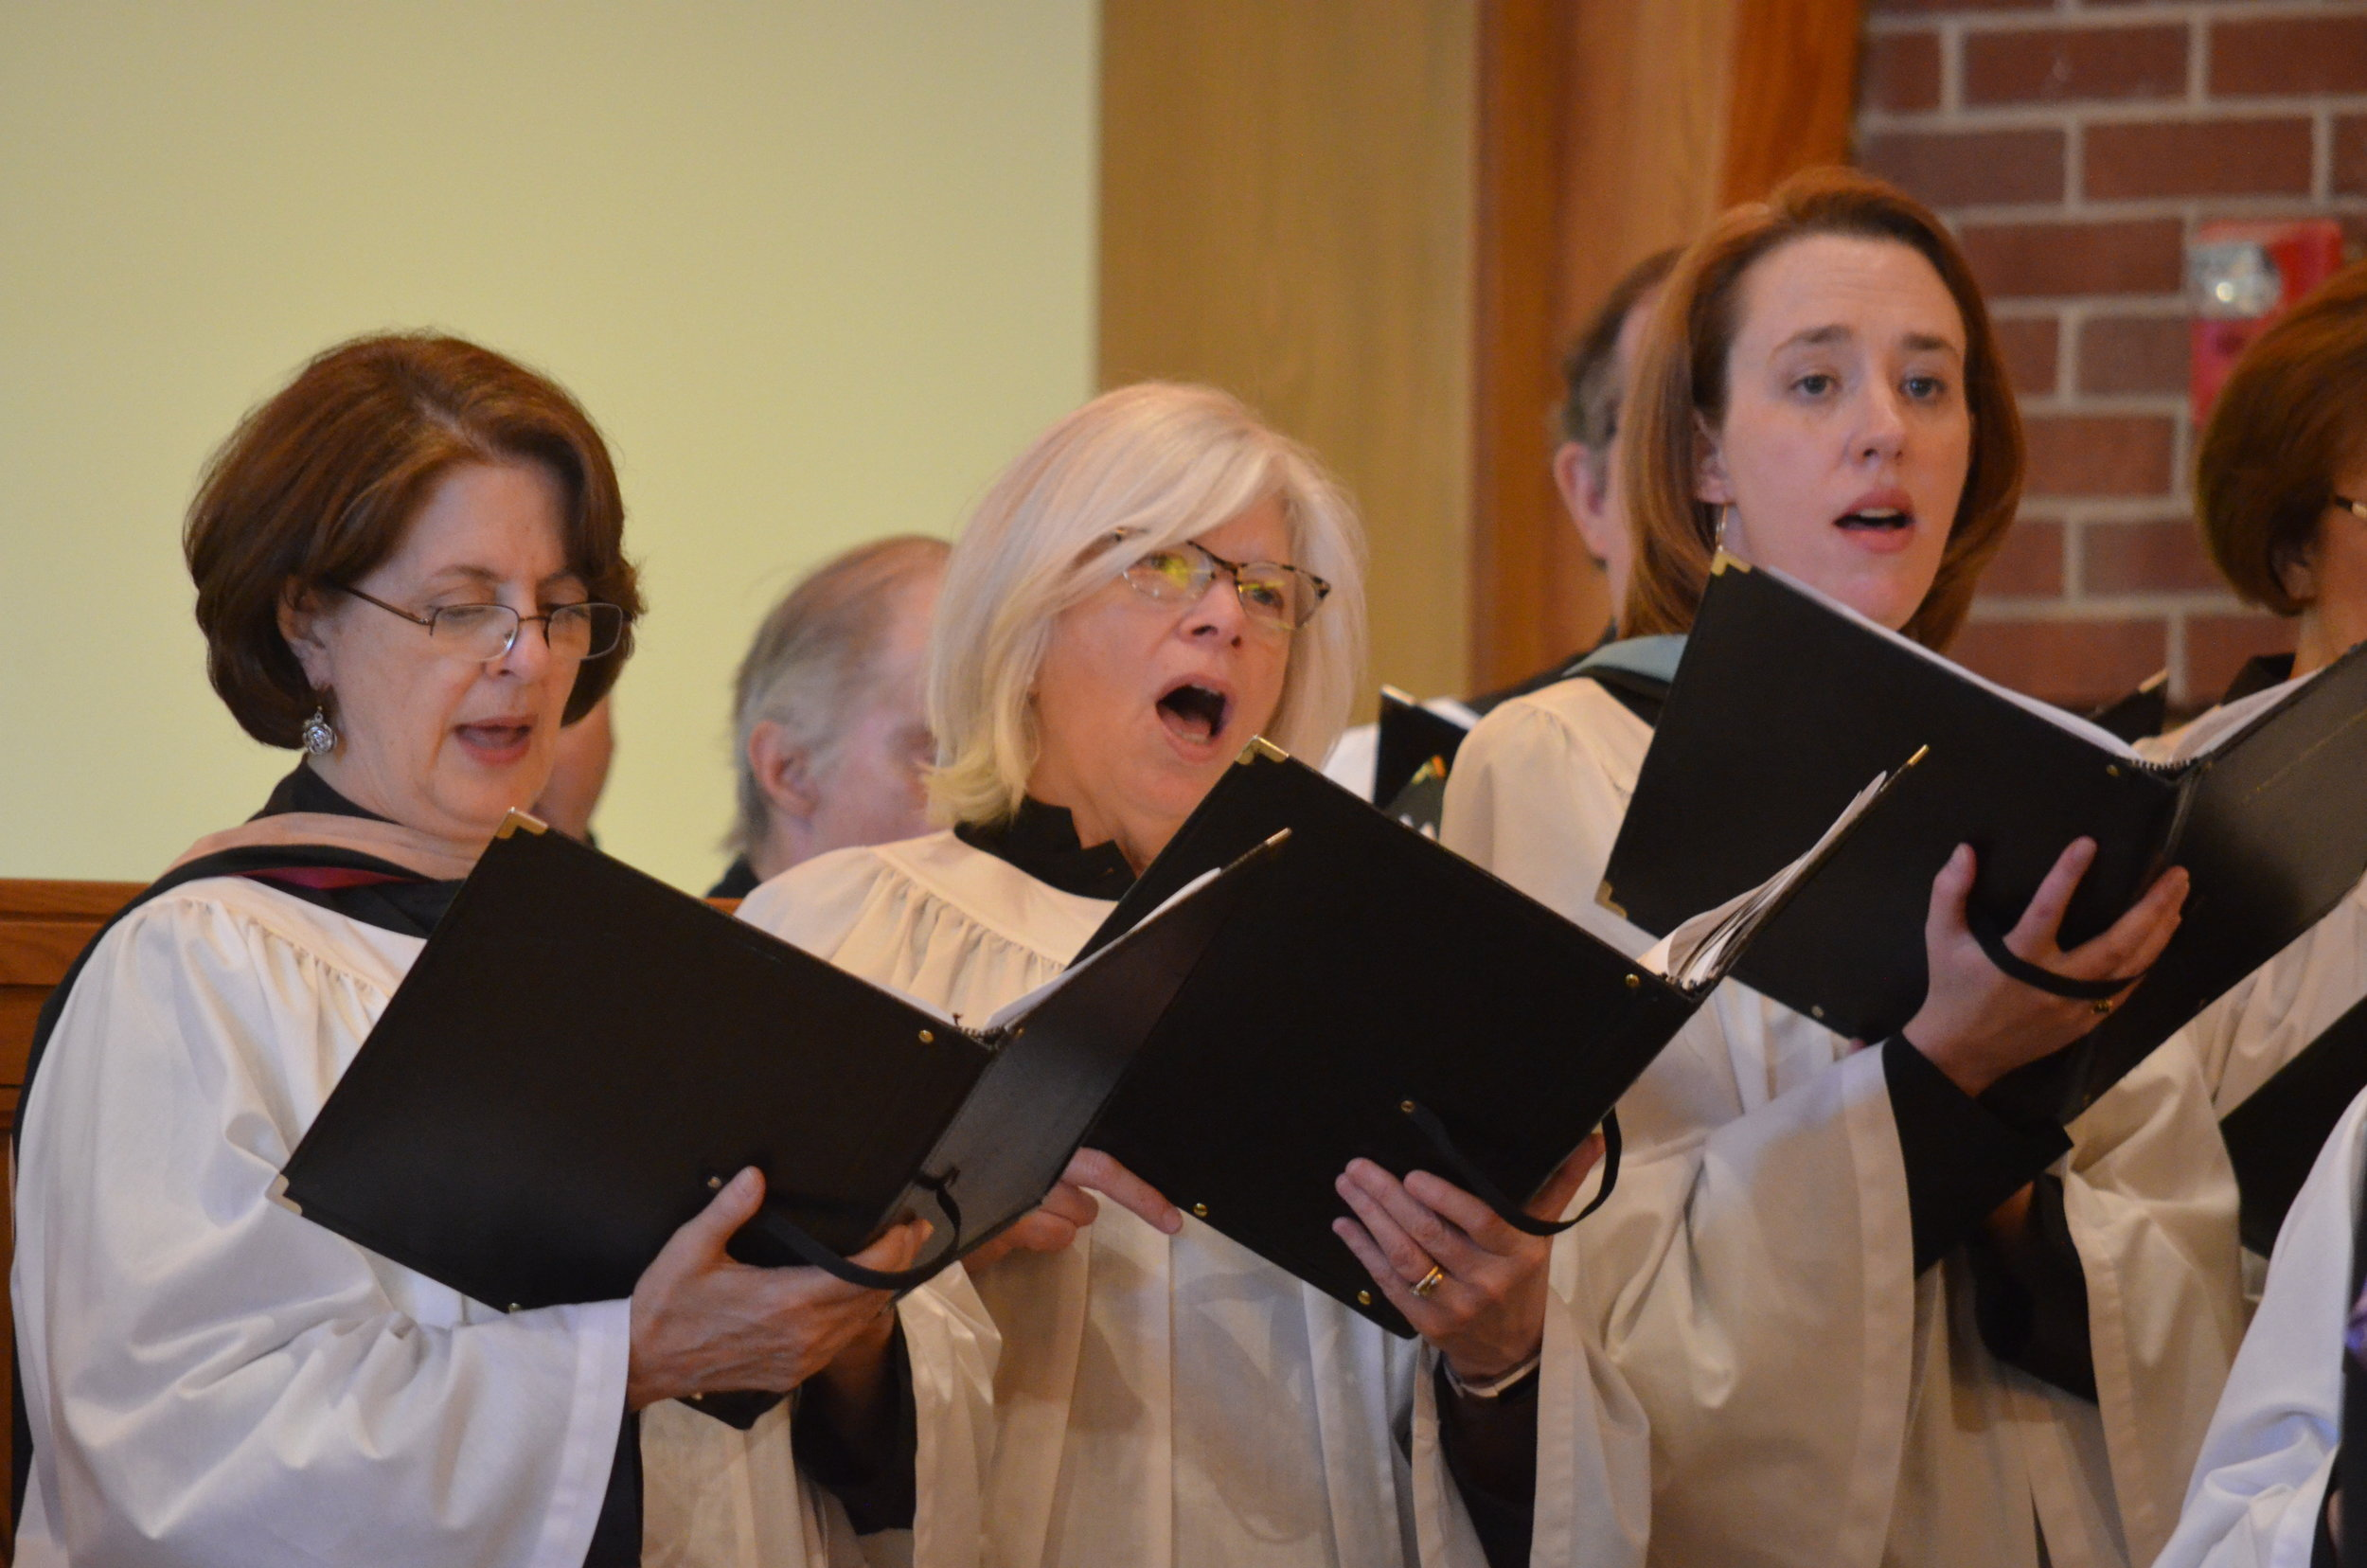 Adult Choir singers at St. Michael's Episcopal Church, Raleigh